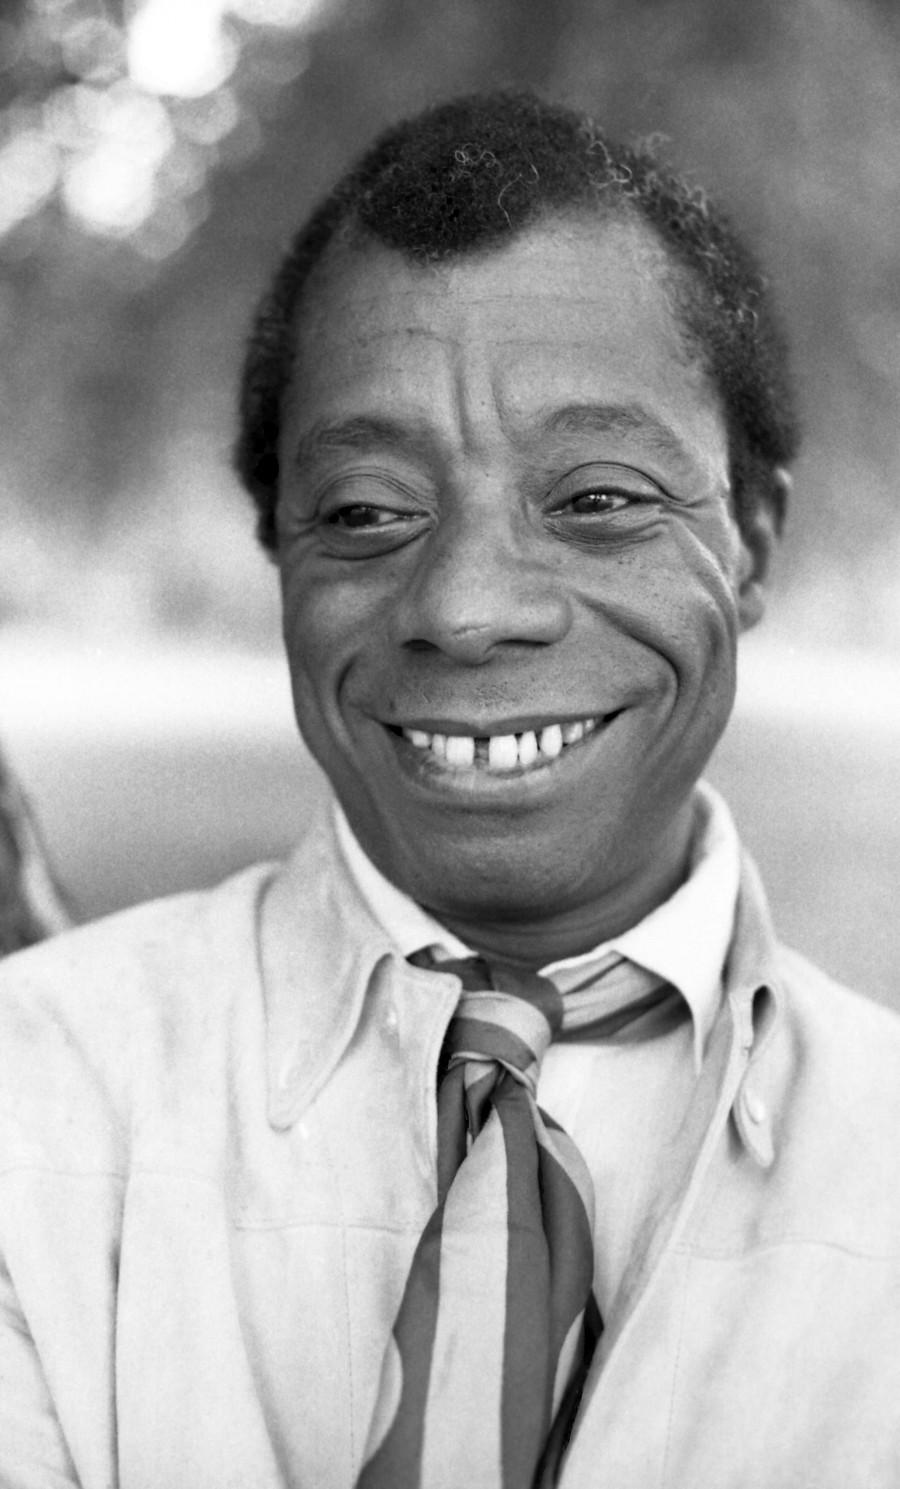 James_Baldwin_35AllanWarren_Allan_Warren.jpg